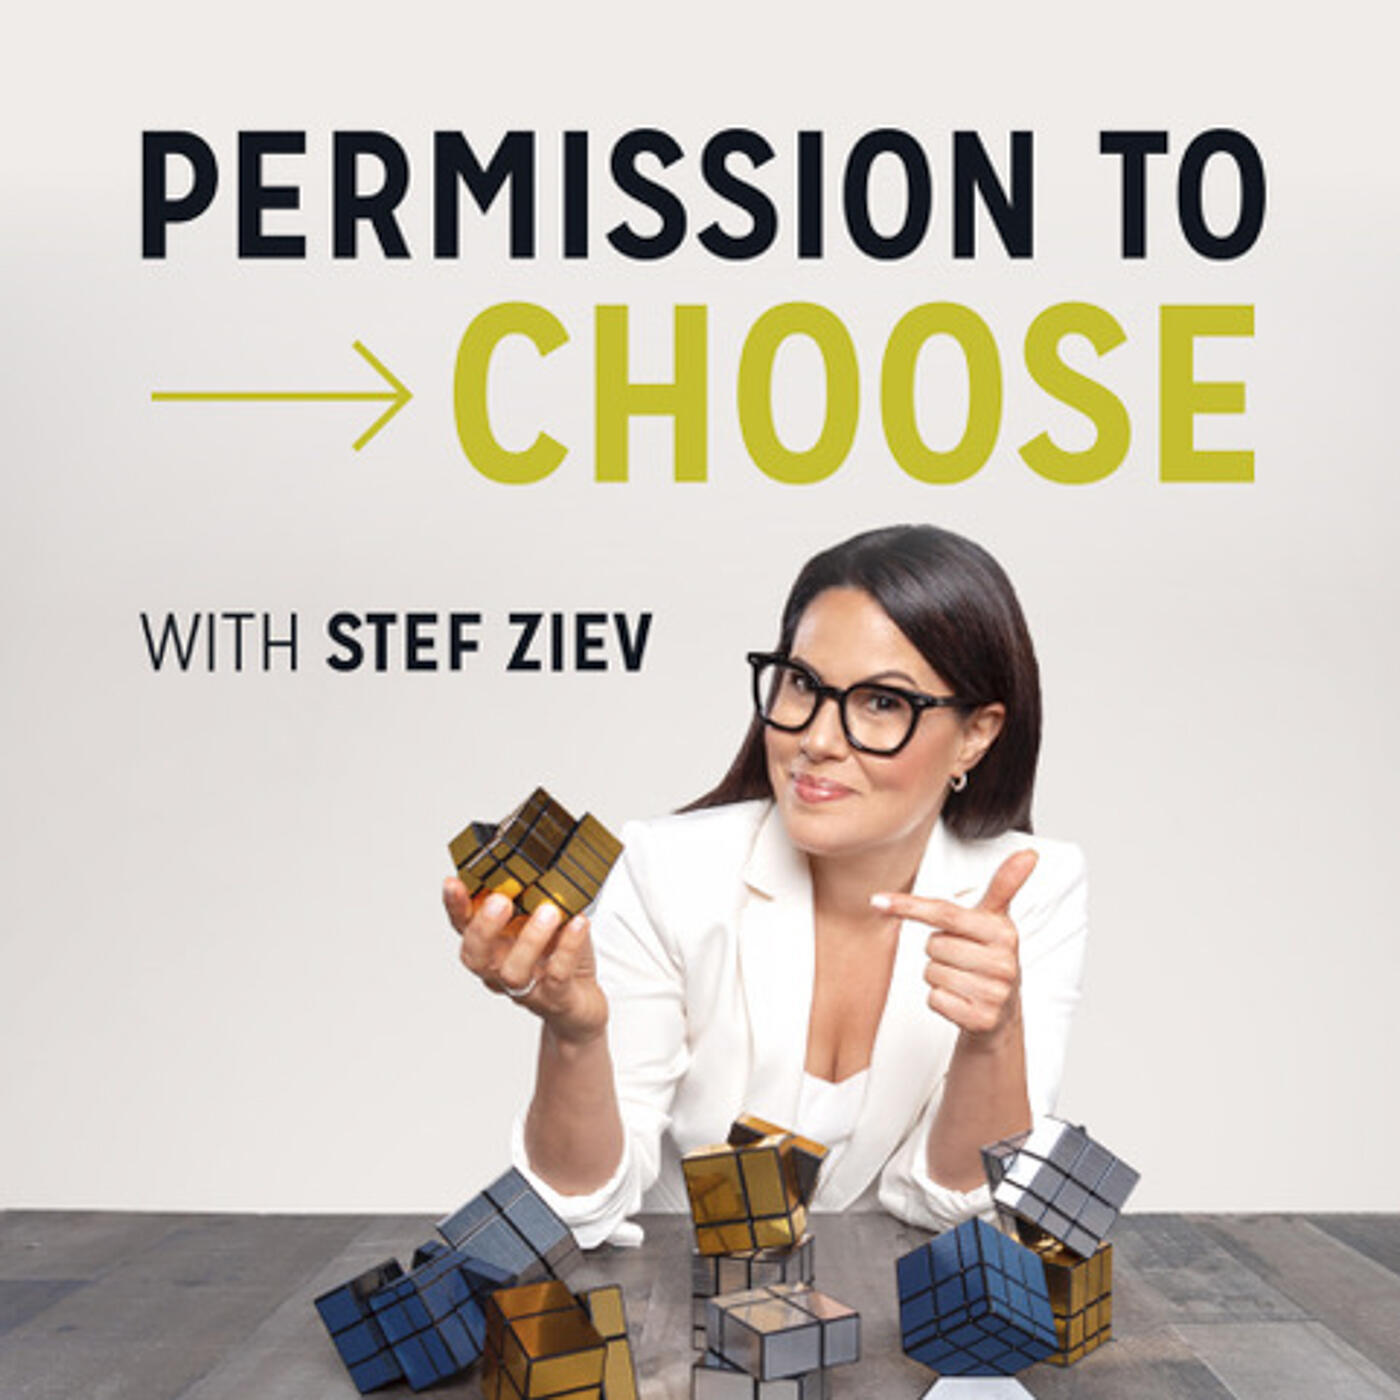 Permission To Choose